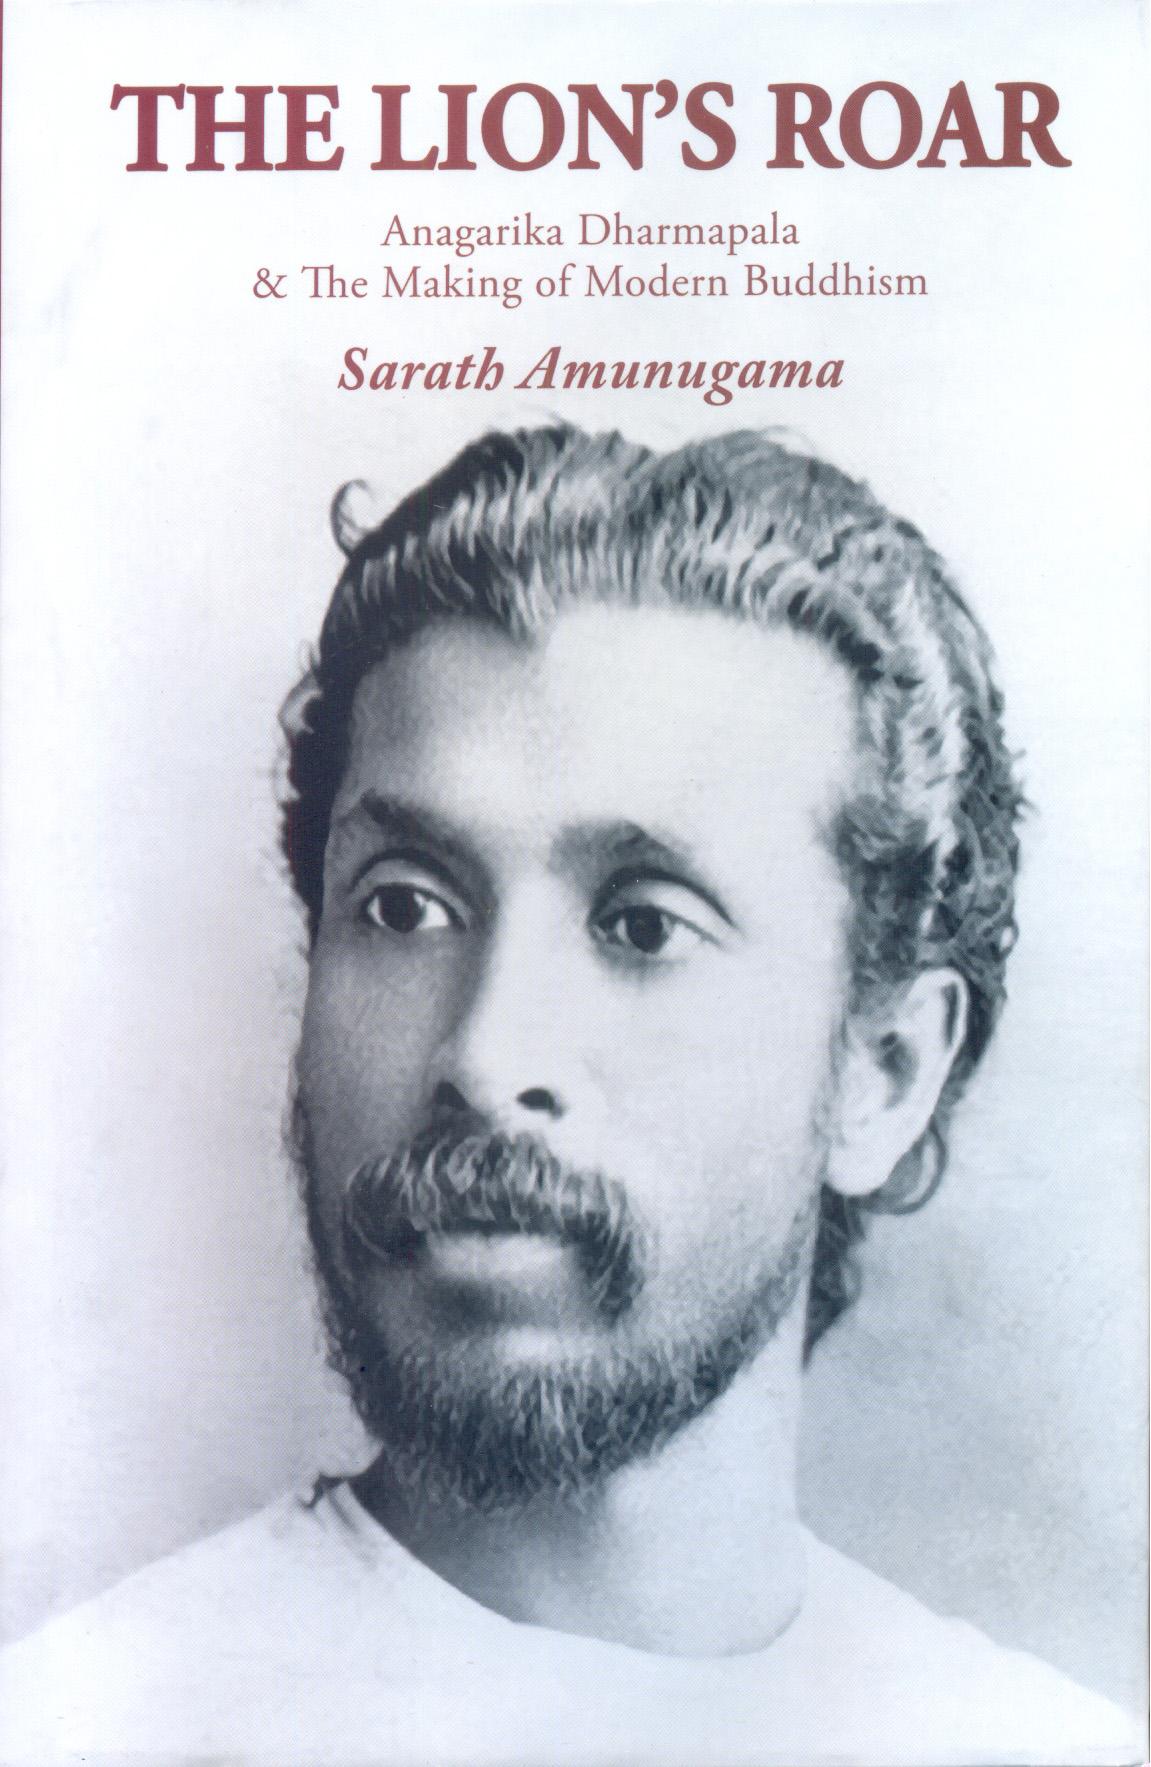 Lions Roar : Anagarika Dharmapala & The Making Of Modern Buddhism